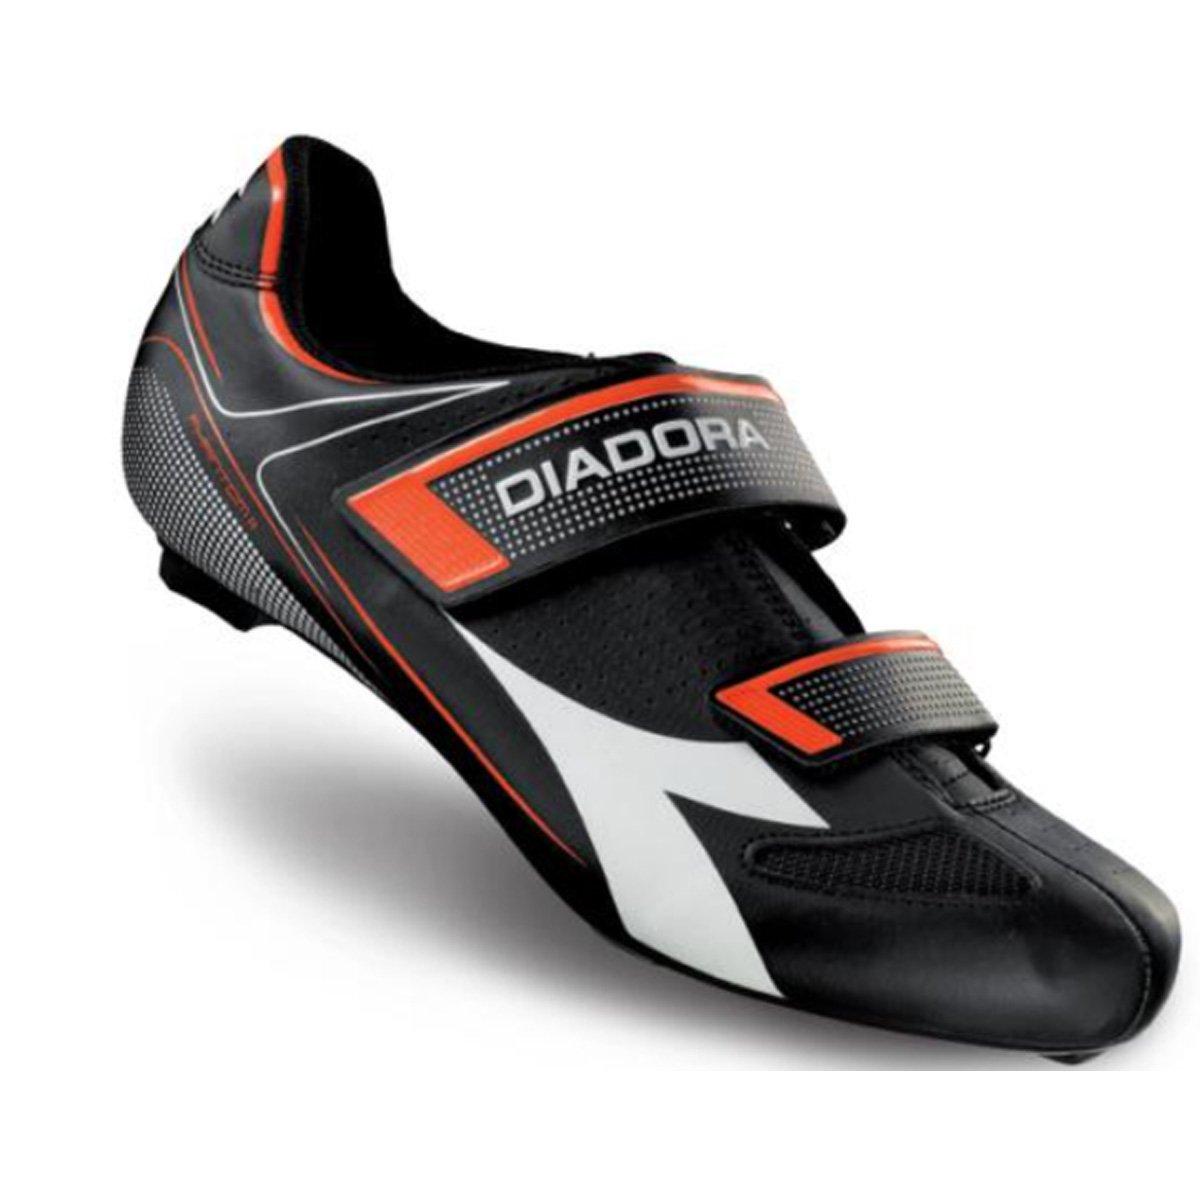 Diadora Men 's Phantom IIロードサイクリング靴 – 170220-c4114 48 ブラック B01NAE9Z56